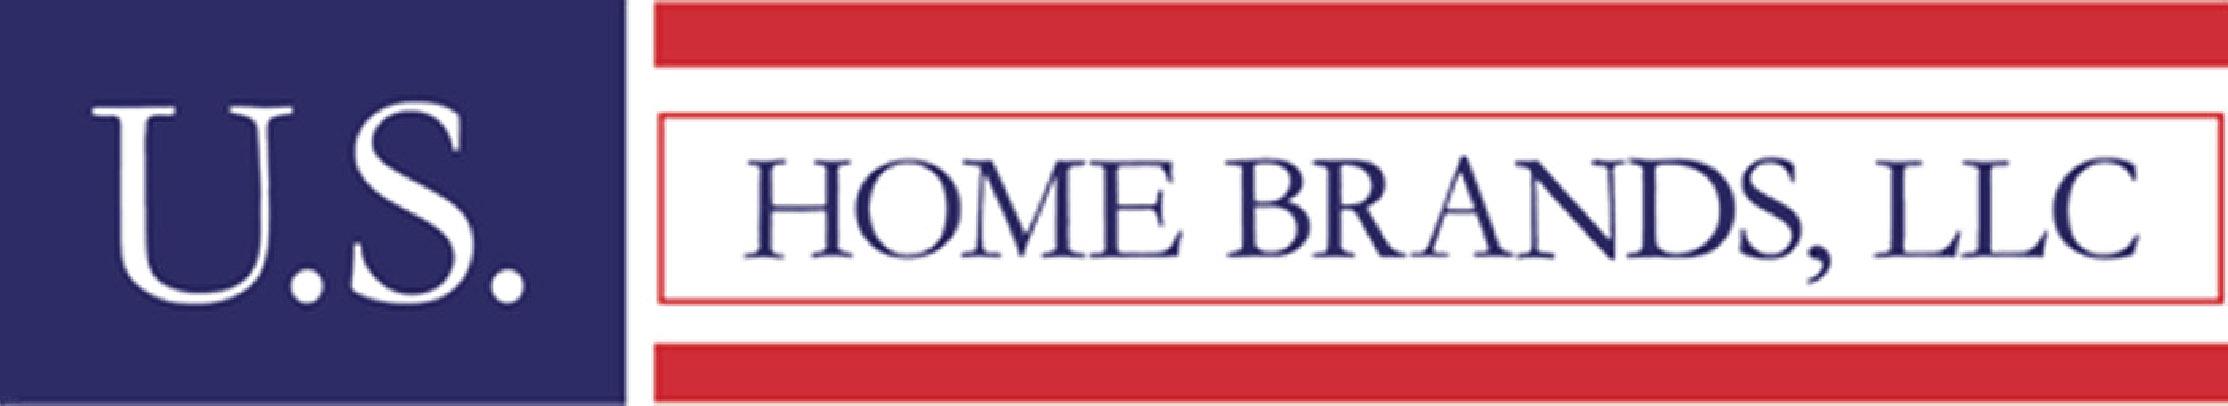 U S Home Brands